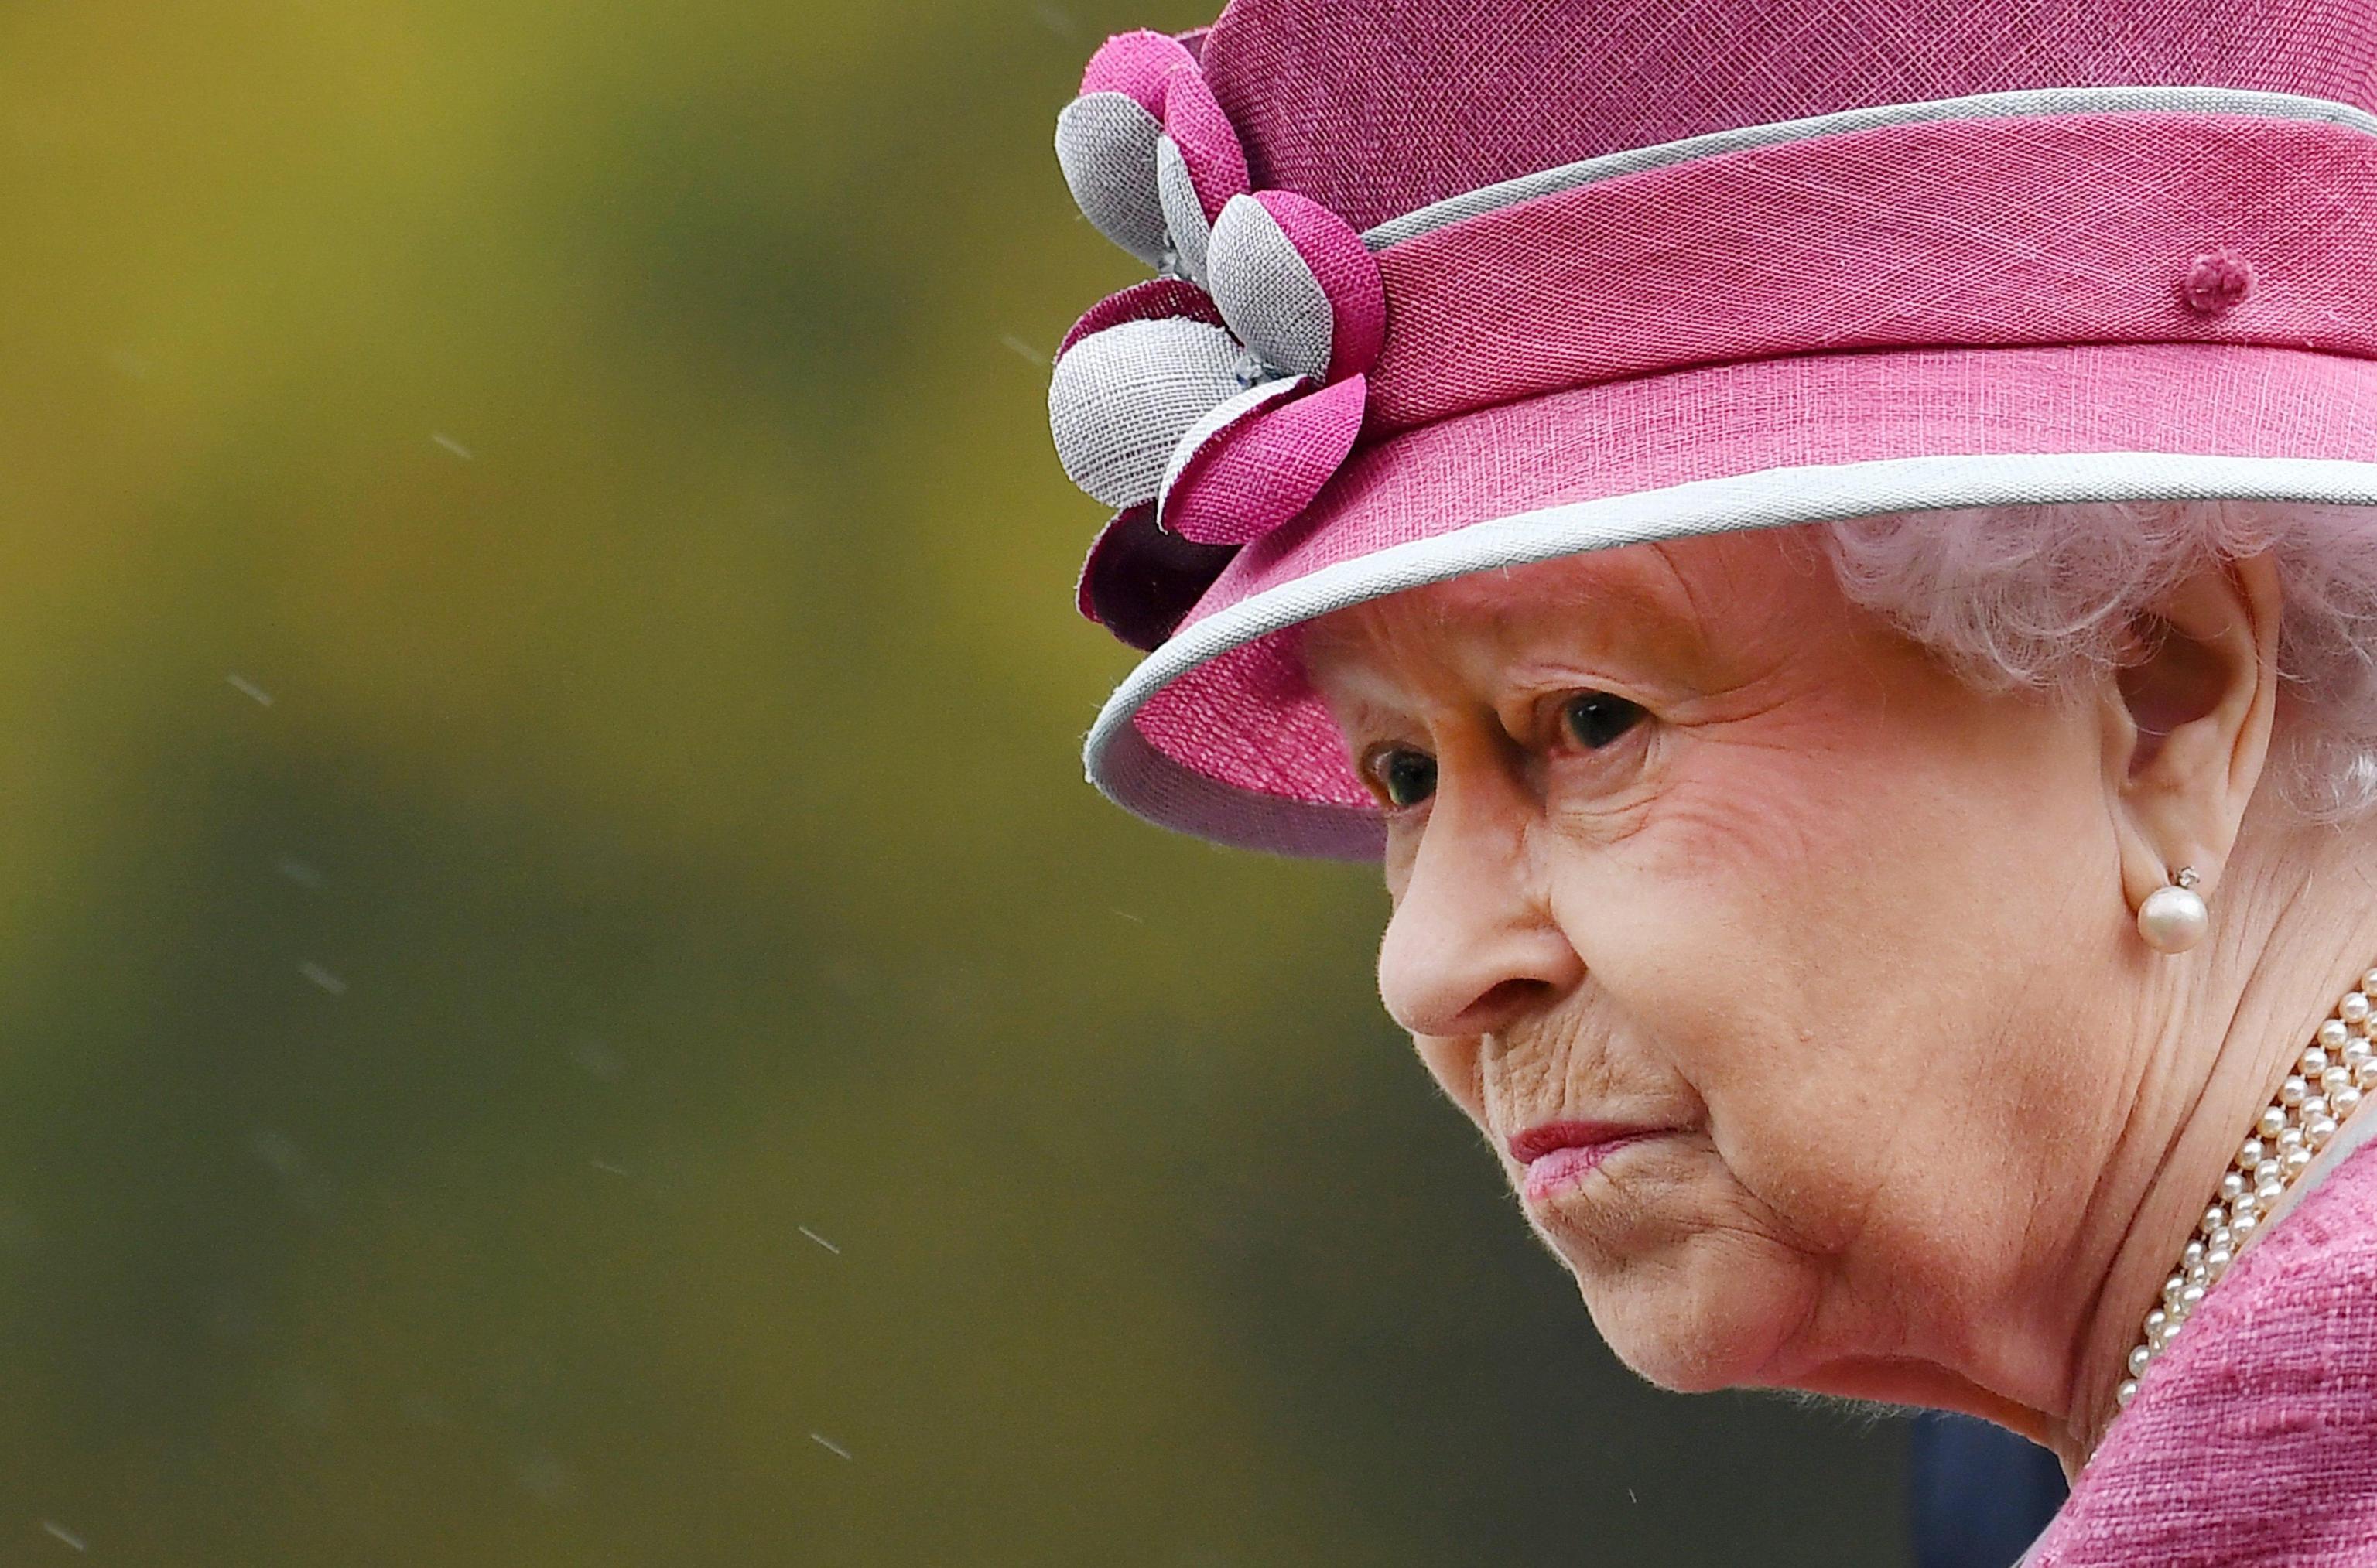 Panama Papers: Regina Elisabetta, Madonna e Bono Vox tra i vip coinvolti